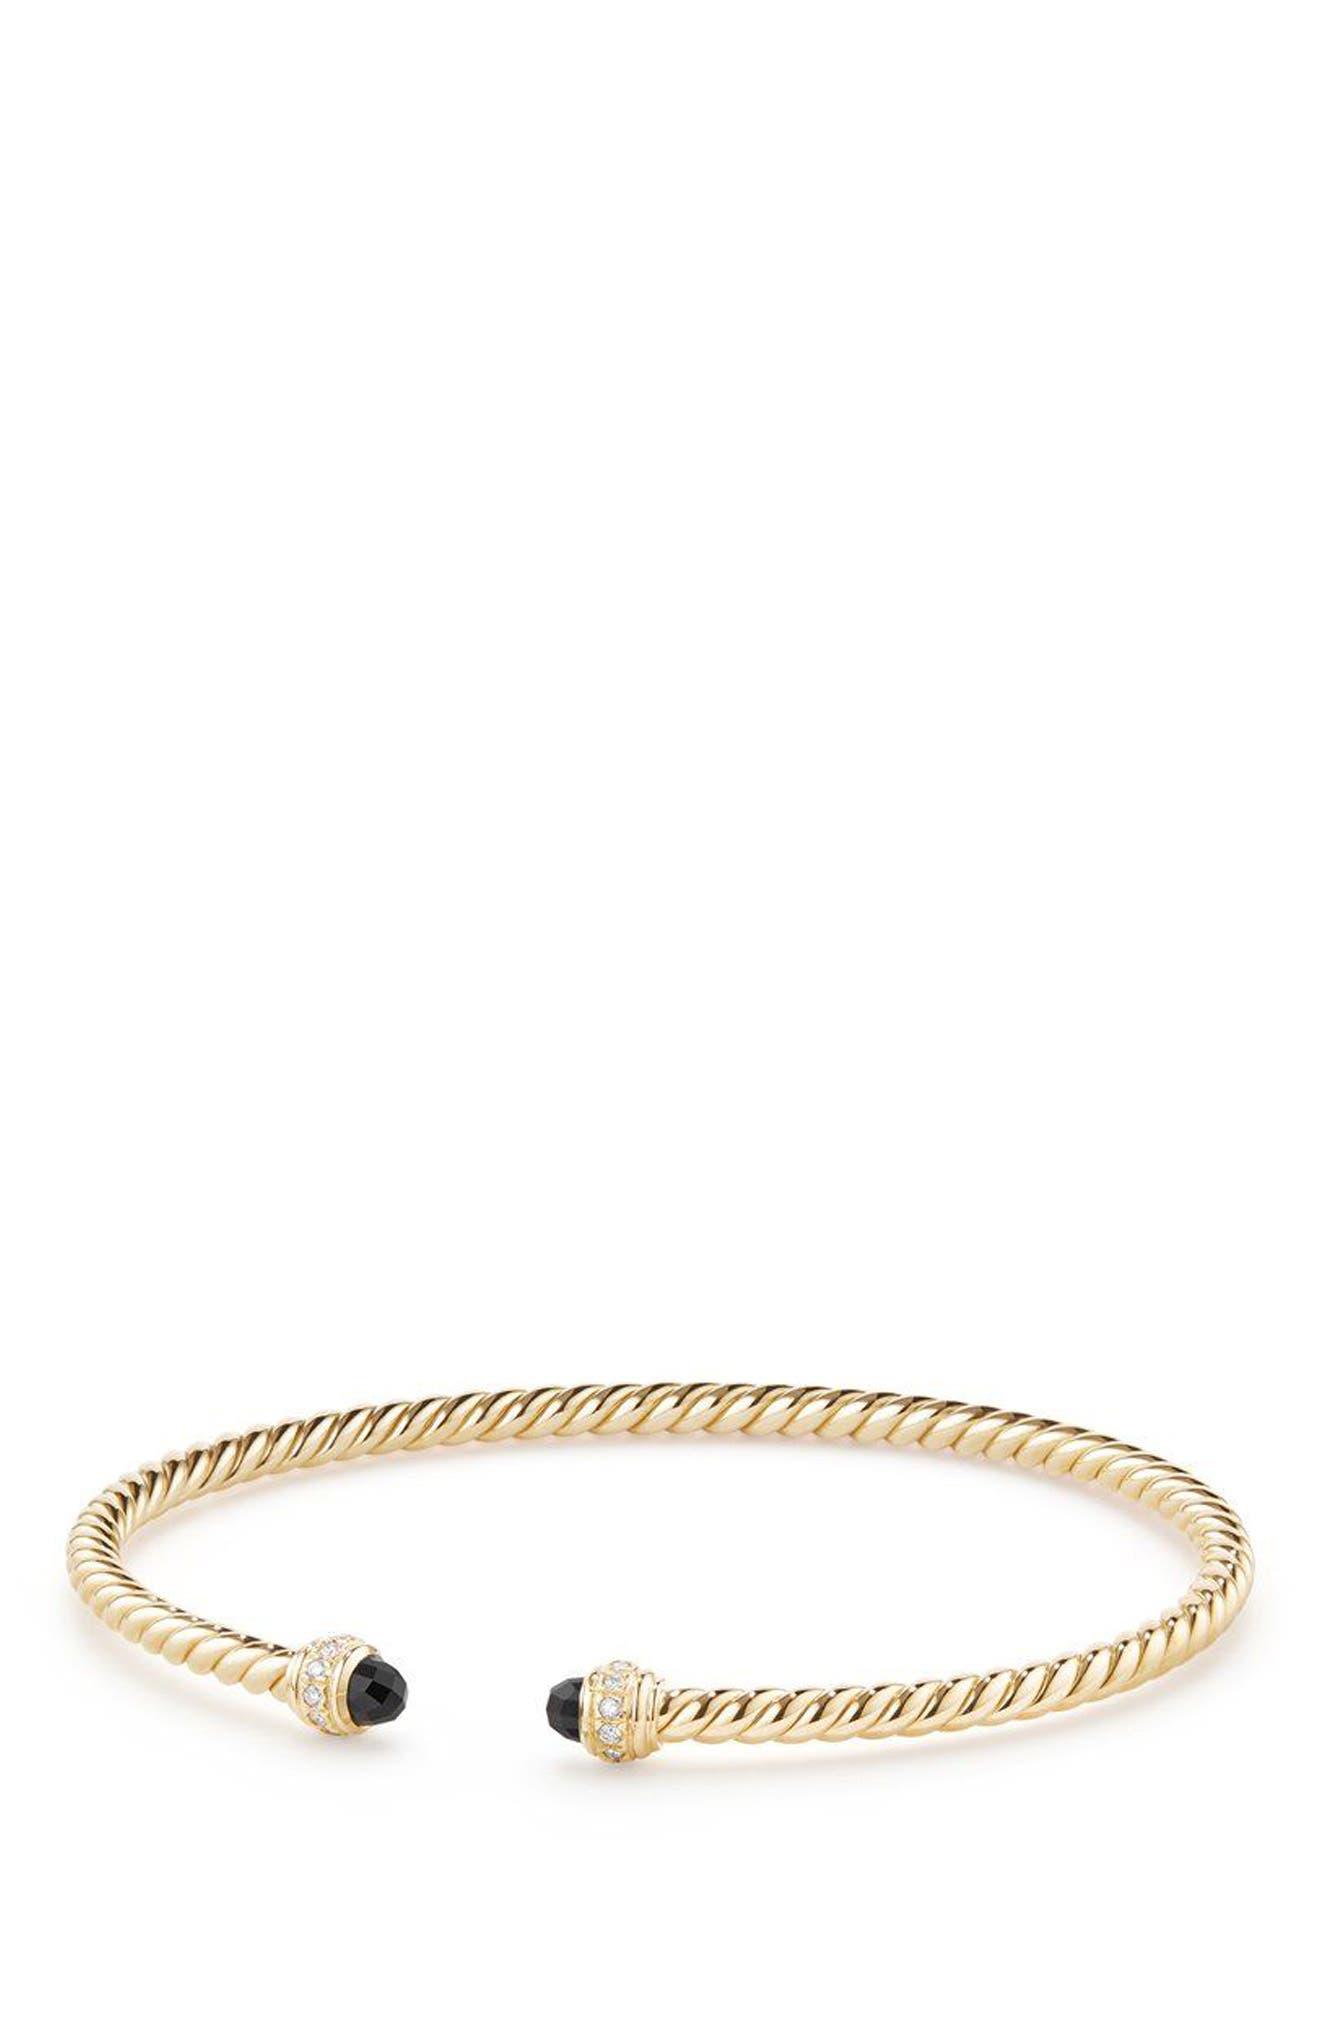 Cable Spira Bracelet in 18K Gold with Diamonds, 3mm,                         Main,                         color, GOLD/ DIAMOND/ BLACK ONYX